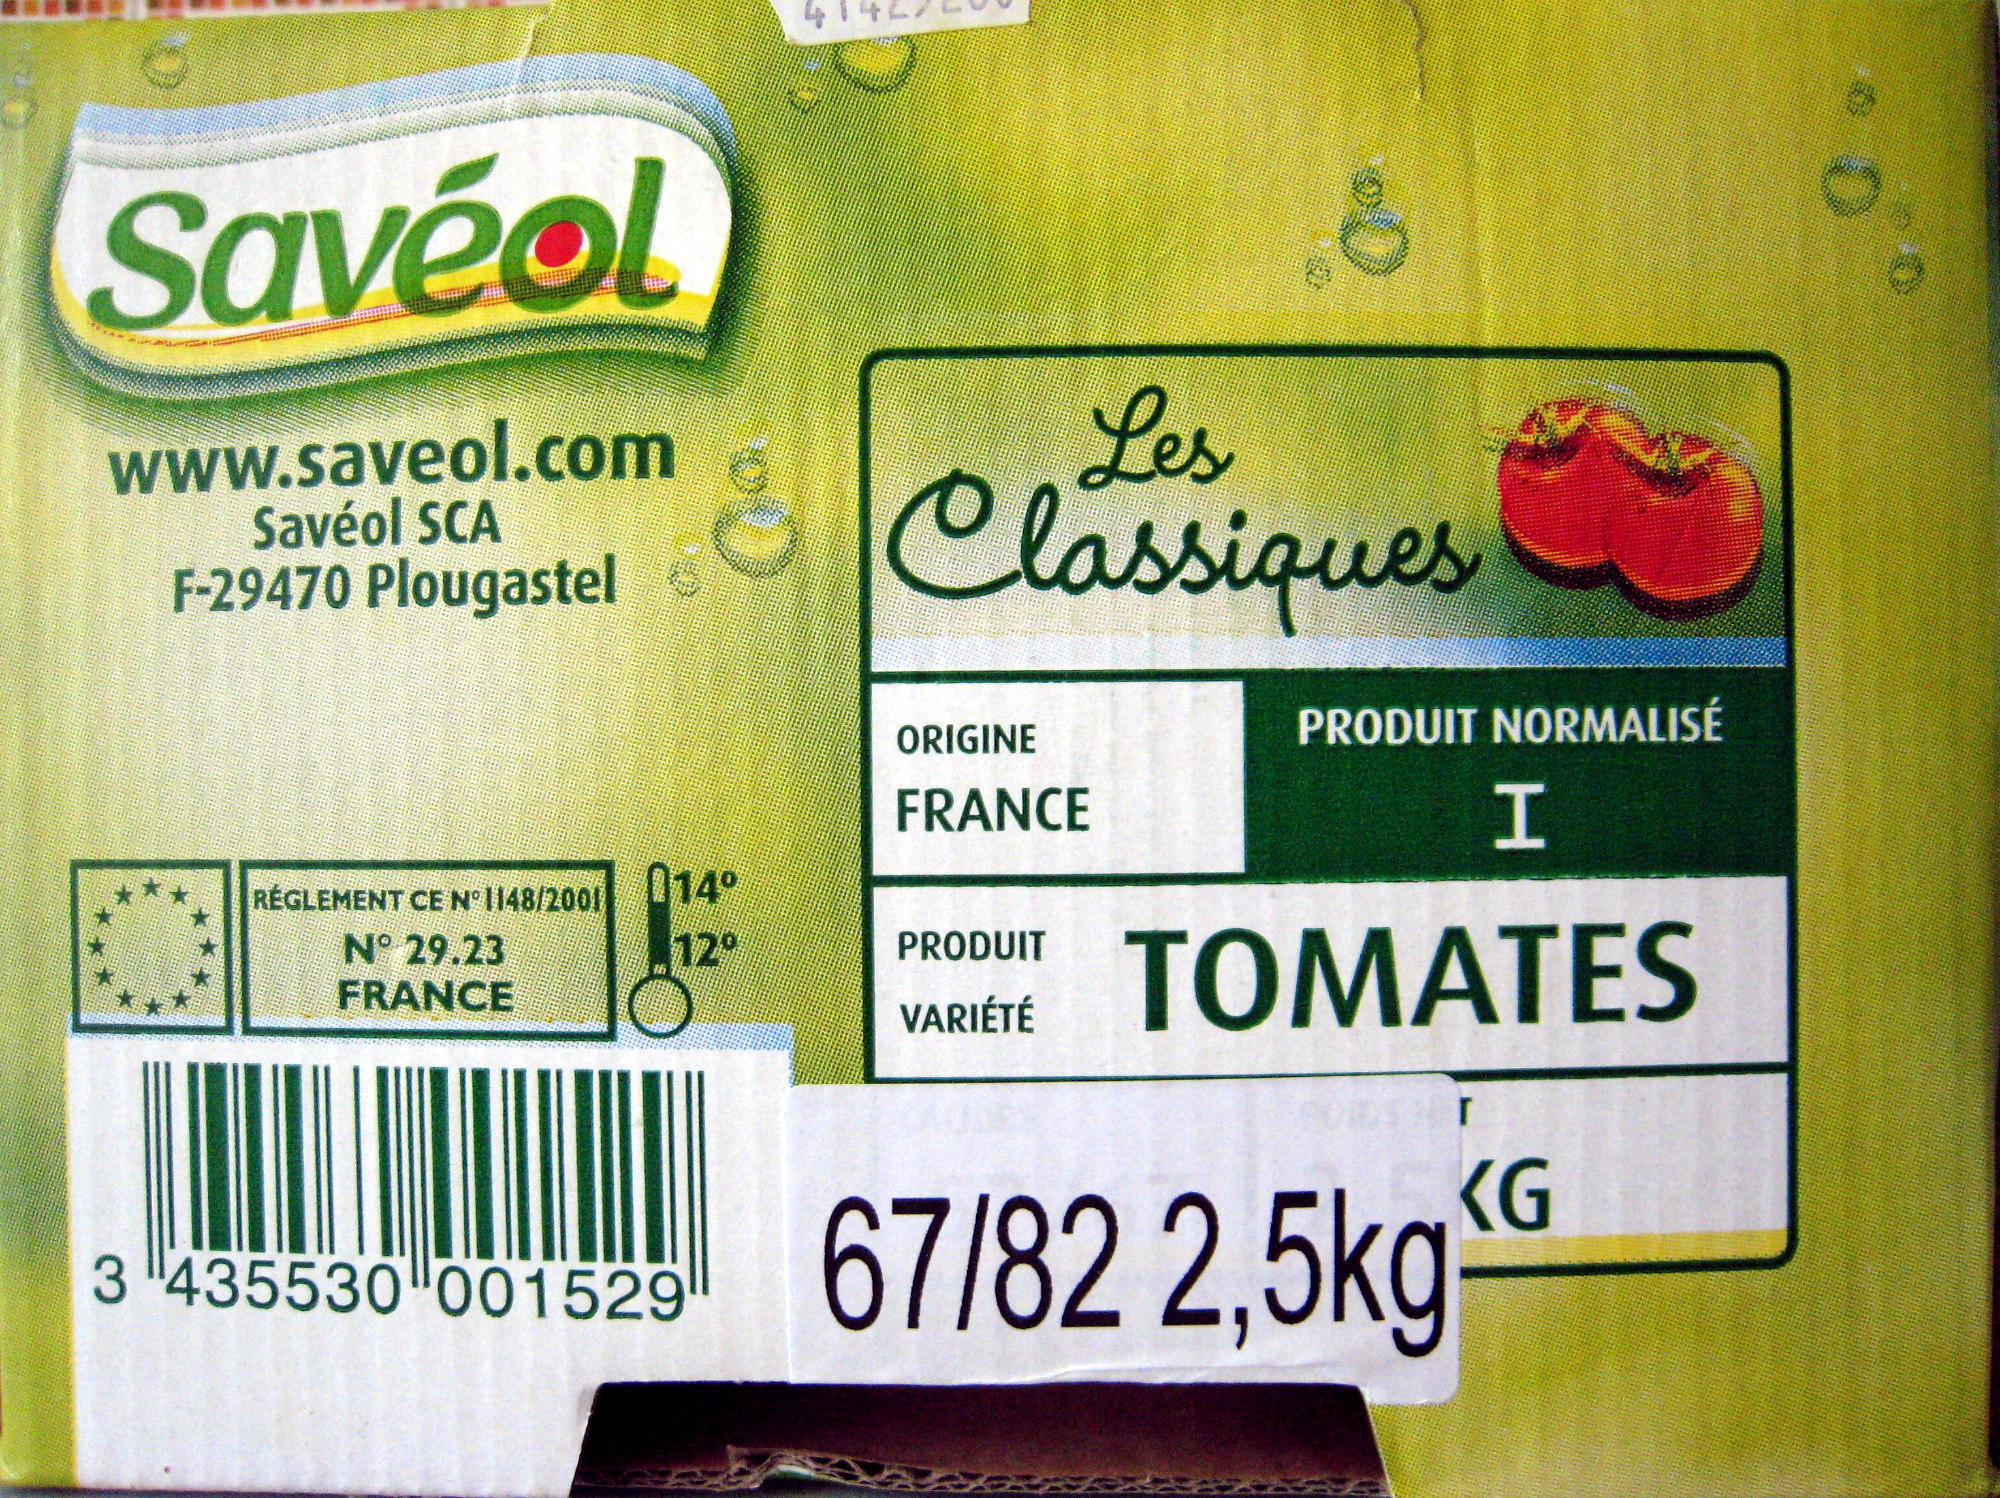 Tomates 2,5 Kg Savéol - Ingrédients